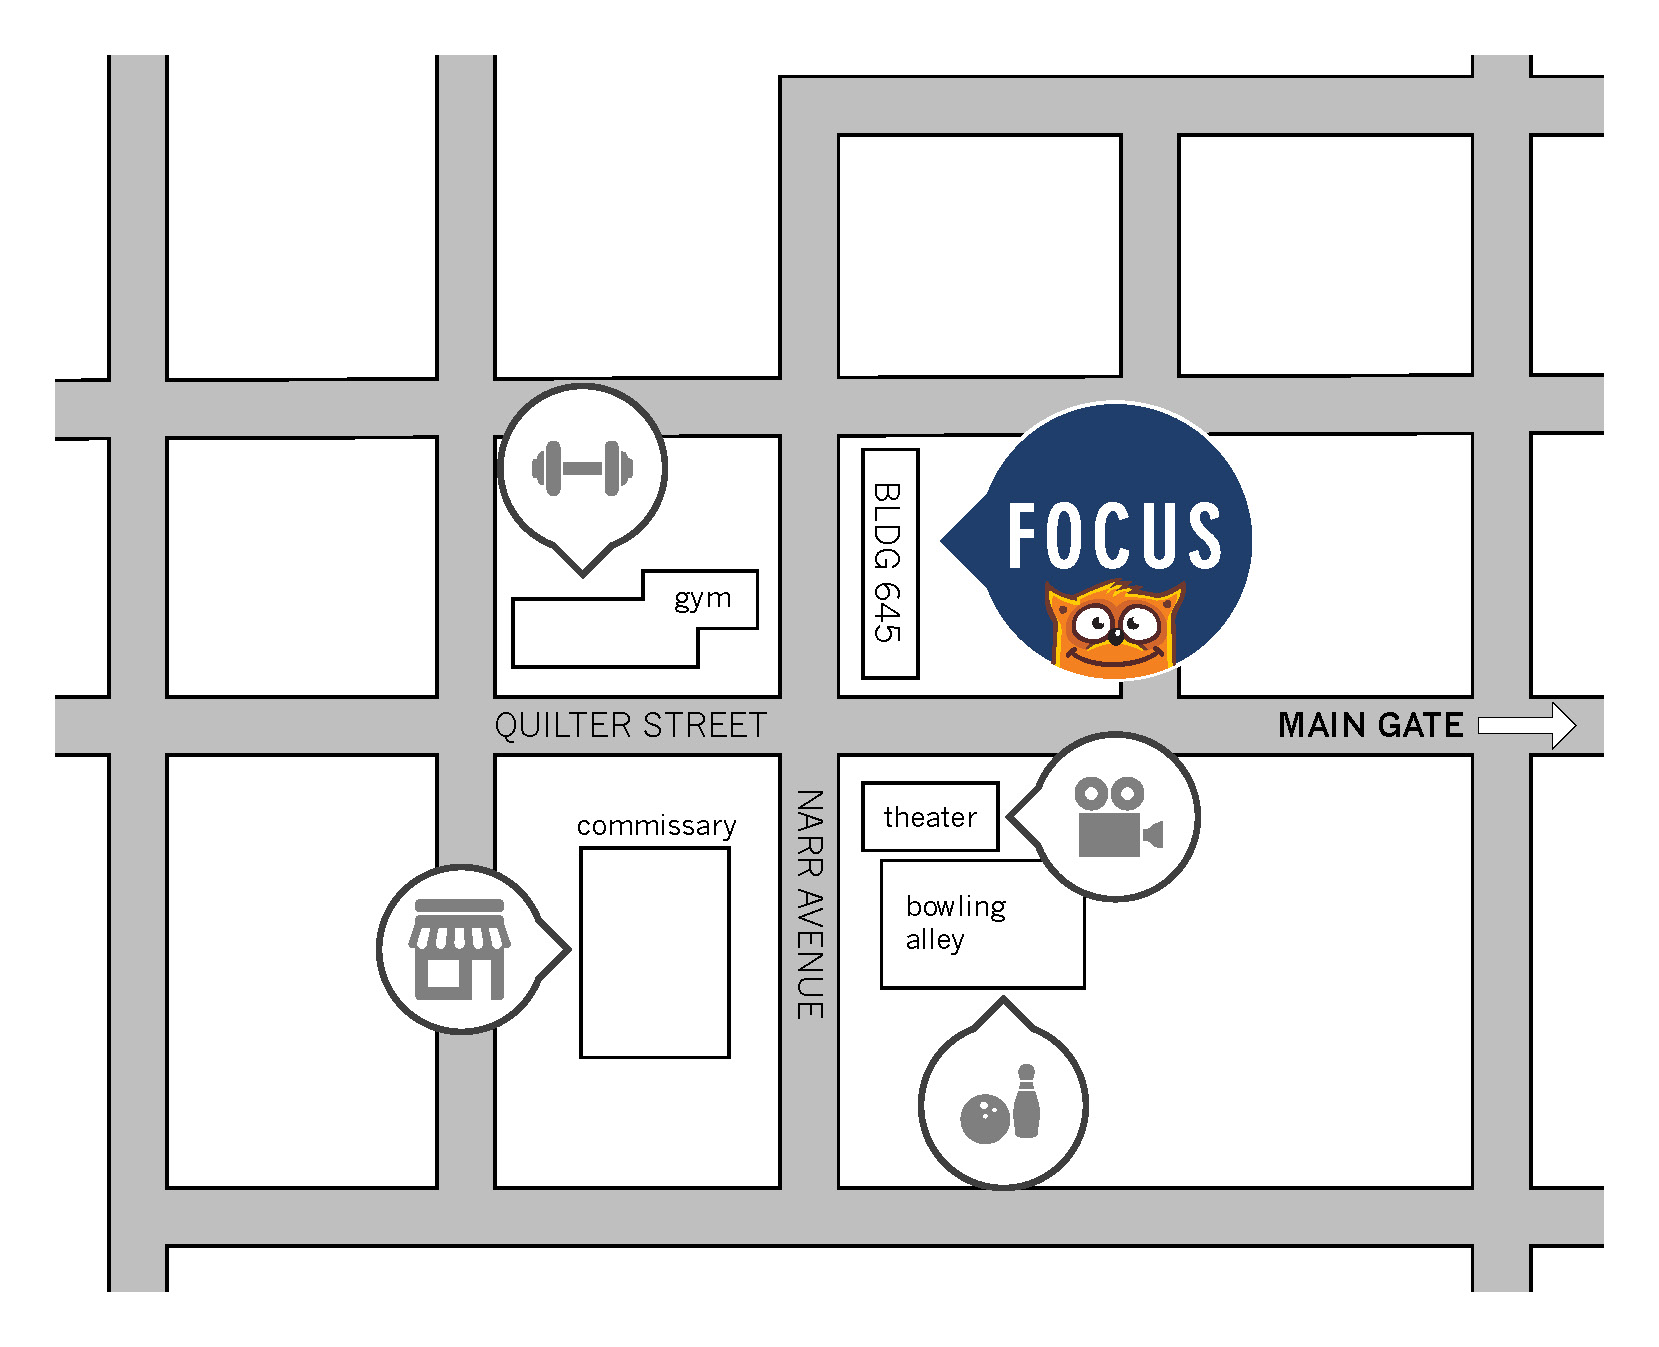 FOCUS Yuma Directions